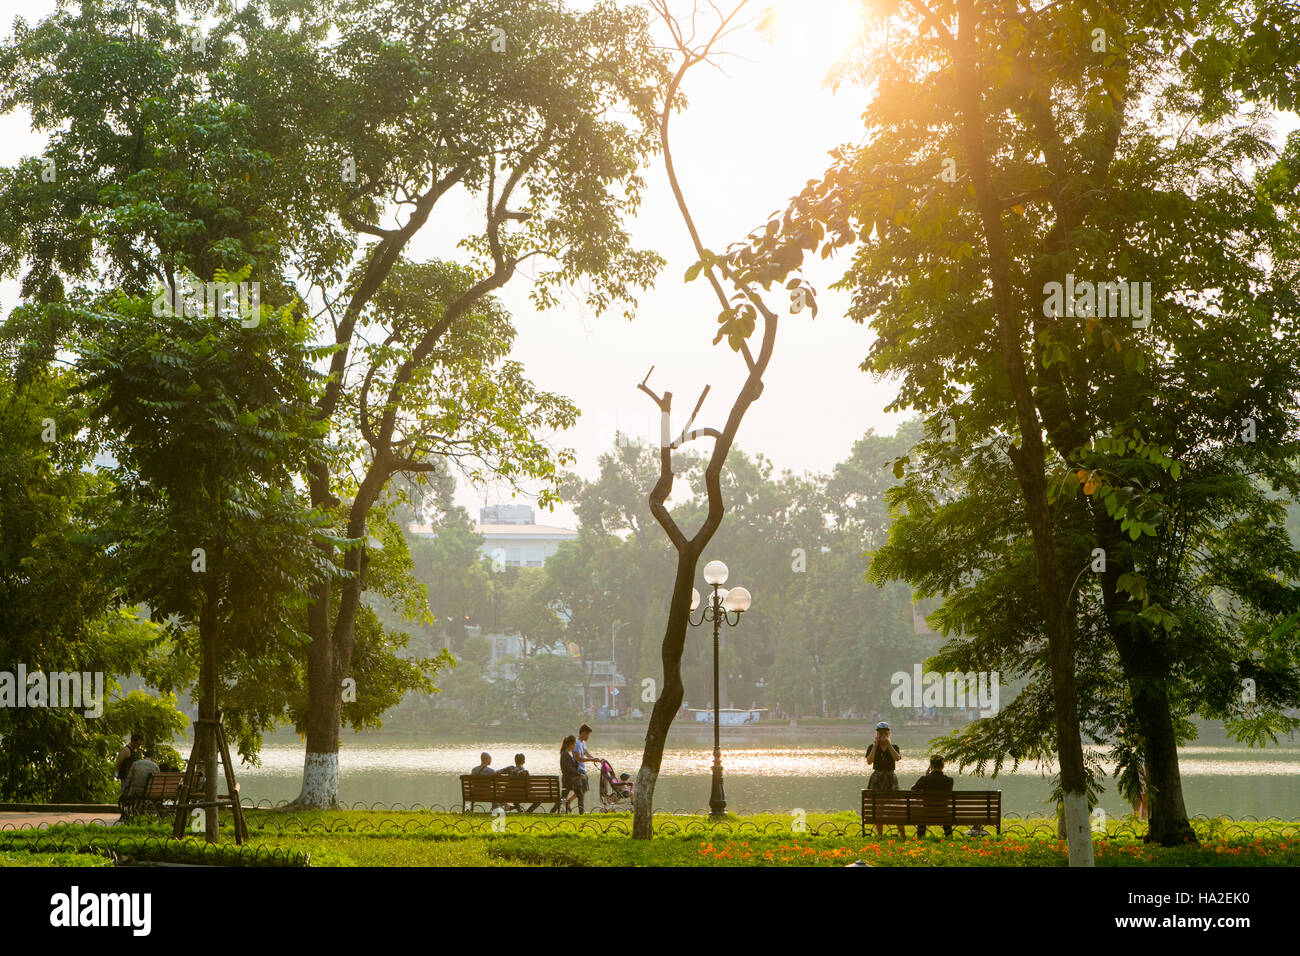 Hoan Kiem Lake, Old Quarter, Hanoi, Vietnam, Asia - Stock Image